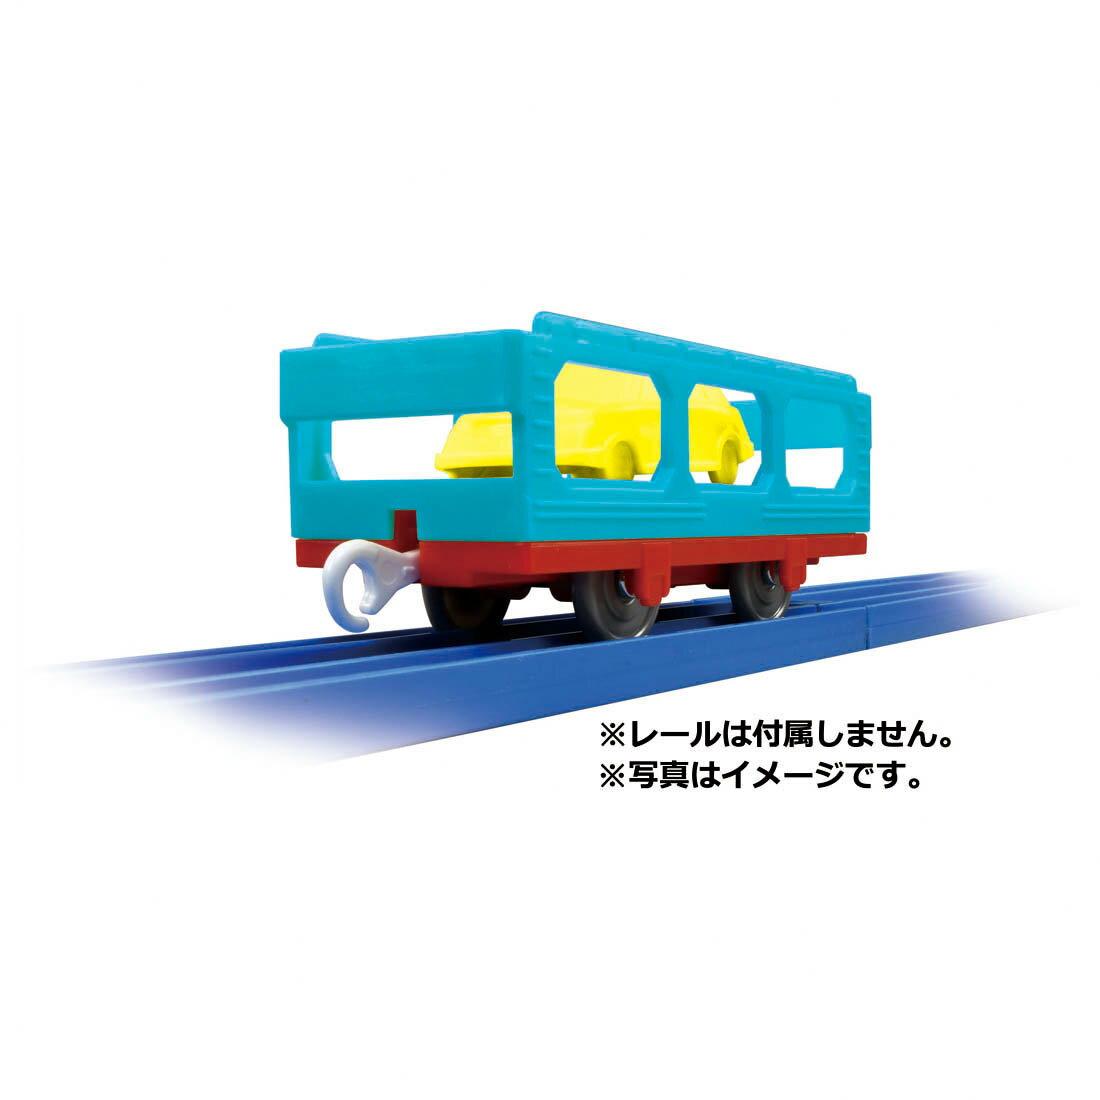 《TAKARA TOMY》PLARAIL鐵道王國 KF-10 TOMICA 運輸車  東喬精品百貨